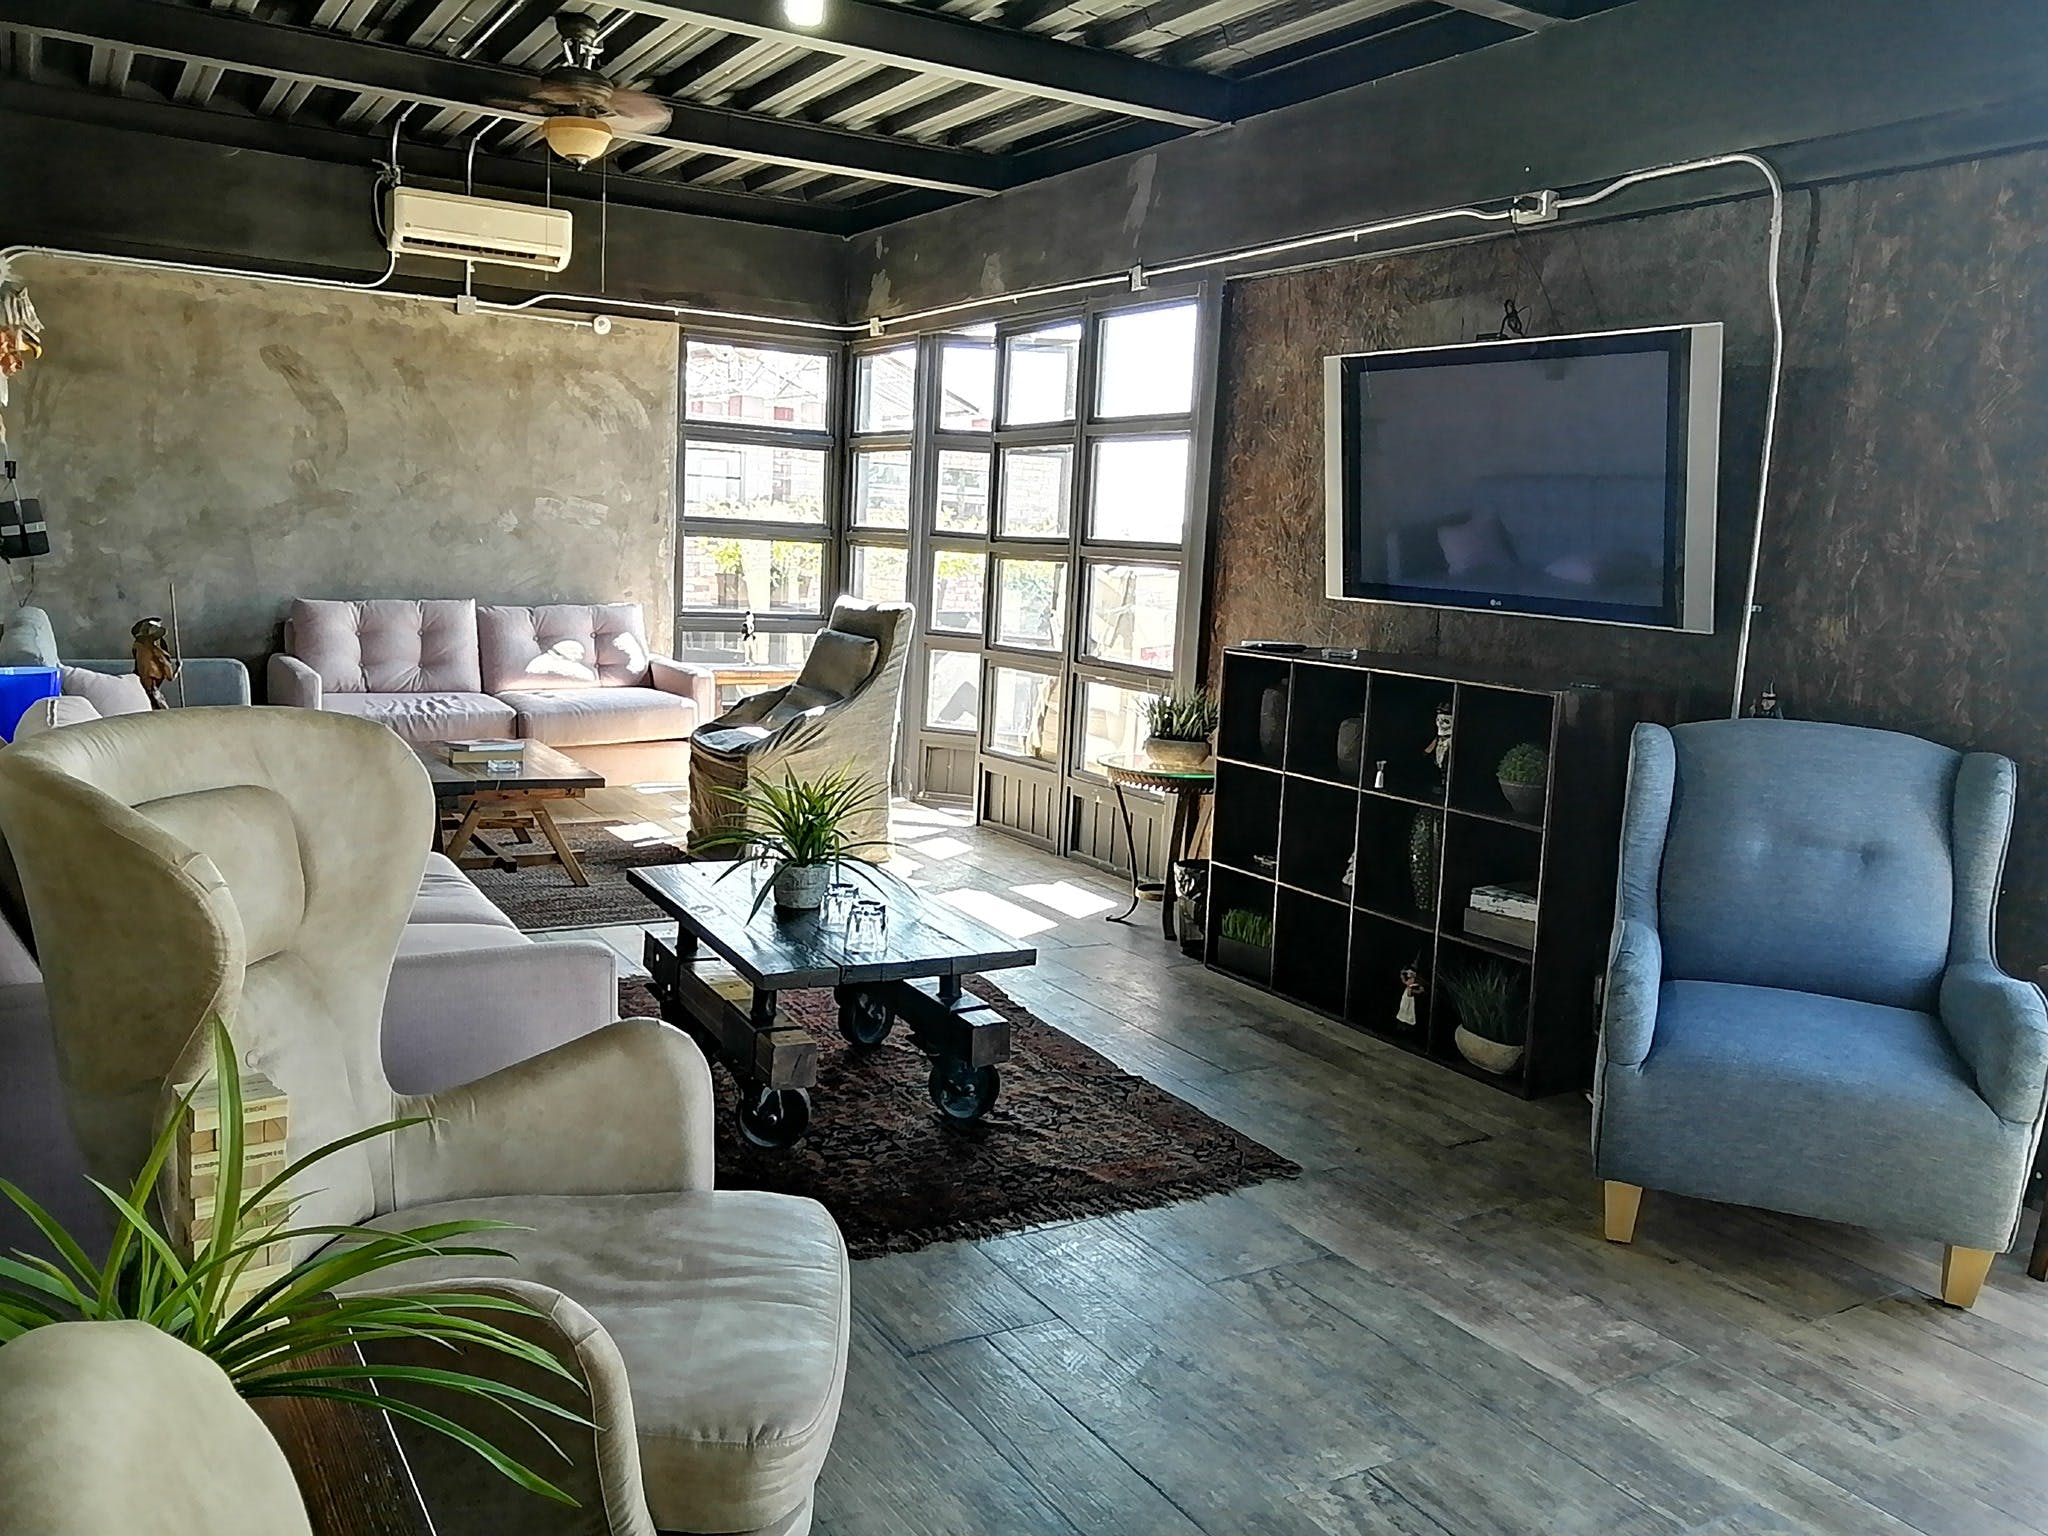 66 Residents   Industrial - Vallejo   Industrial Designed Building w/ Coworking + Rooftop Deck